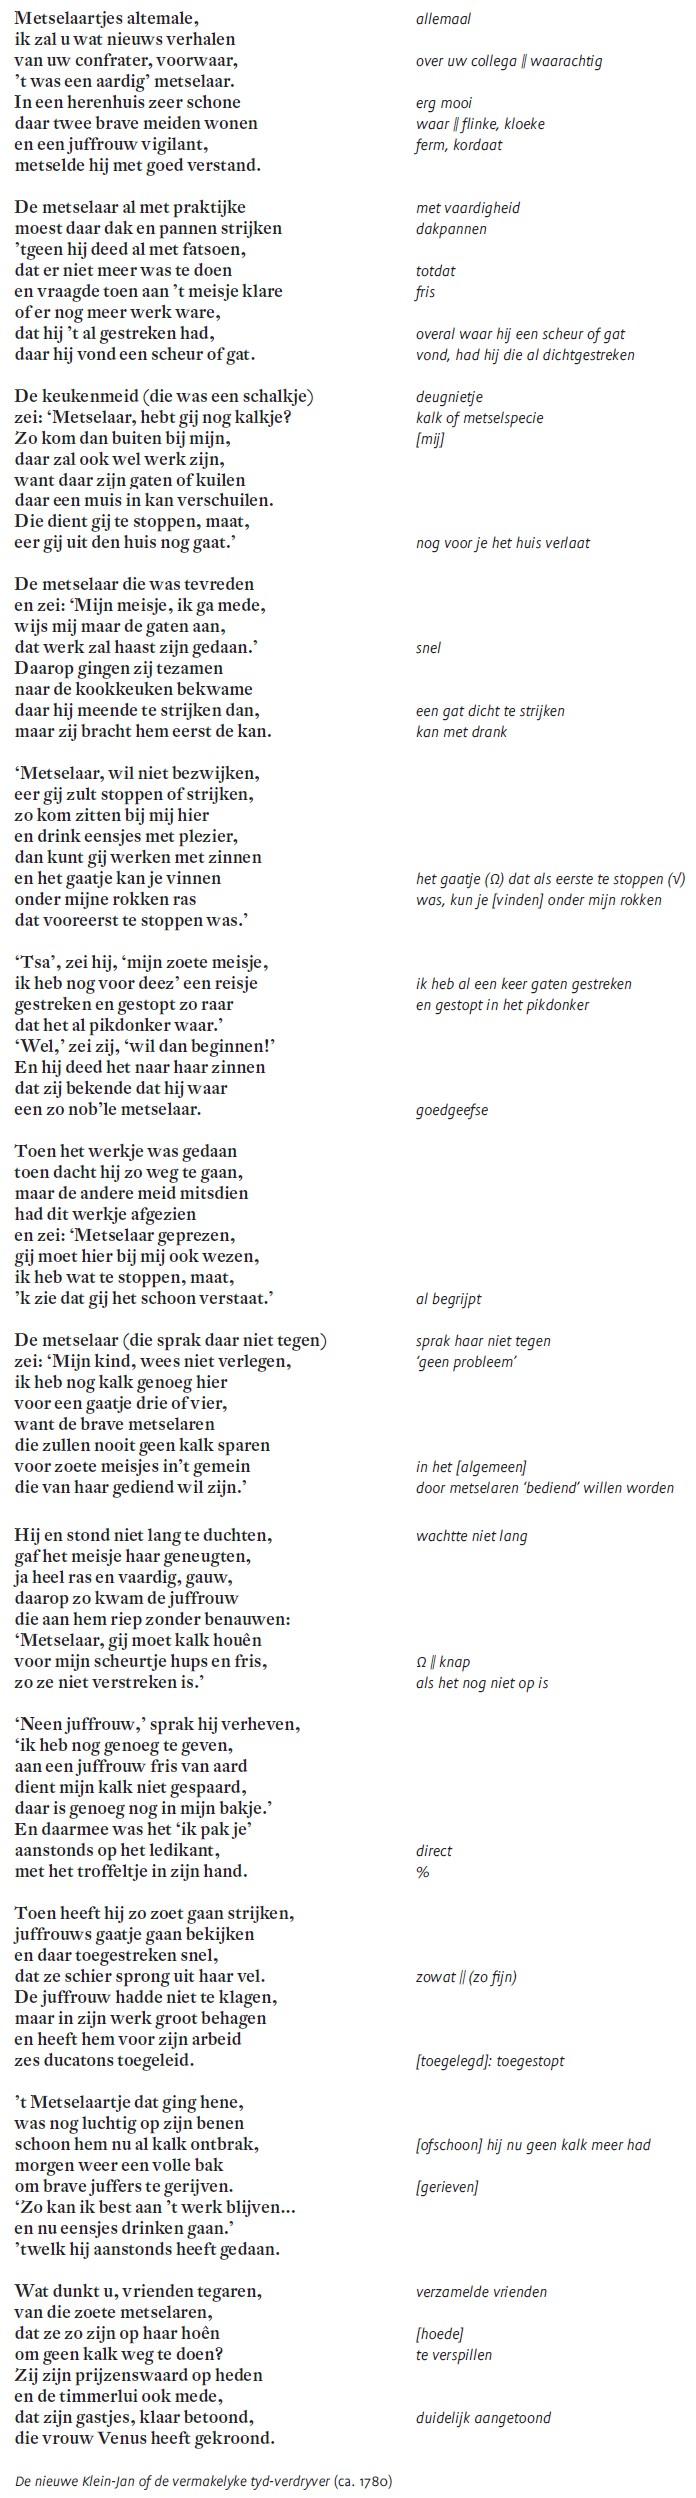 Vieze liedjes uit de 17e en 18e eeuw – Annemieke Houben